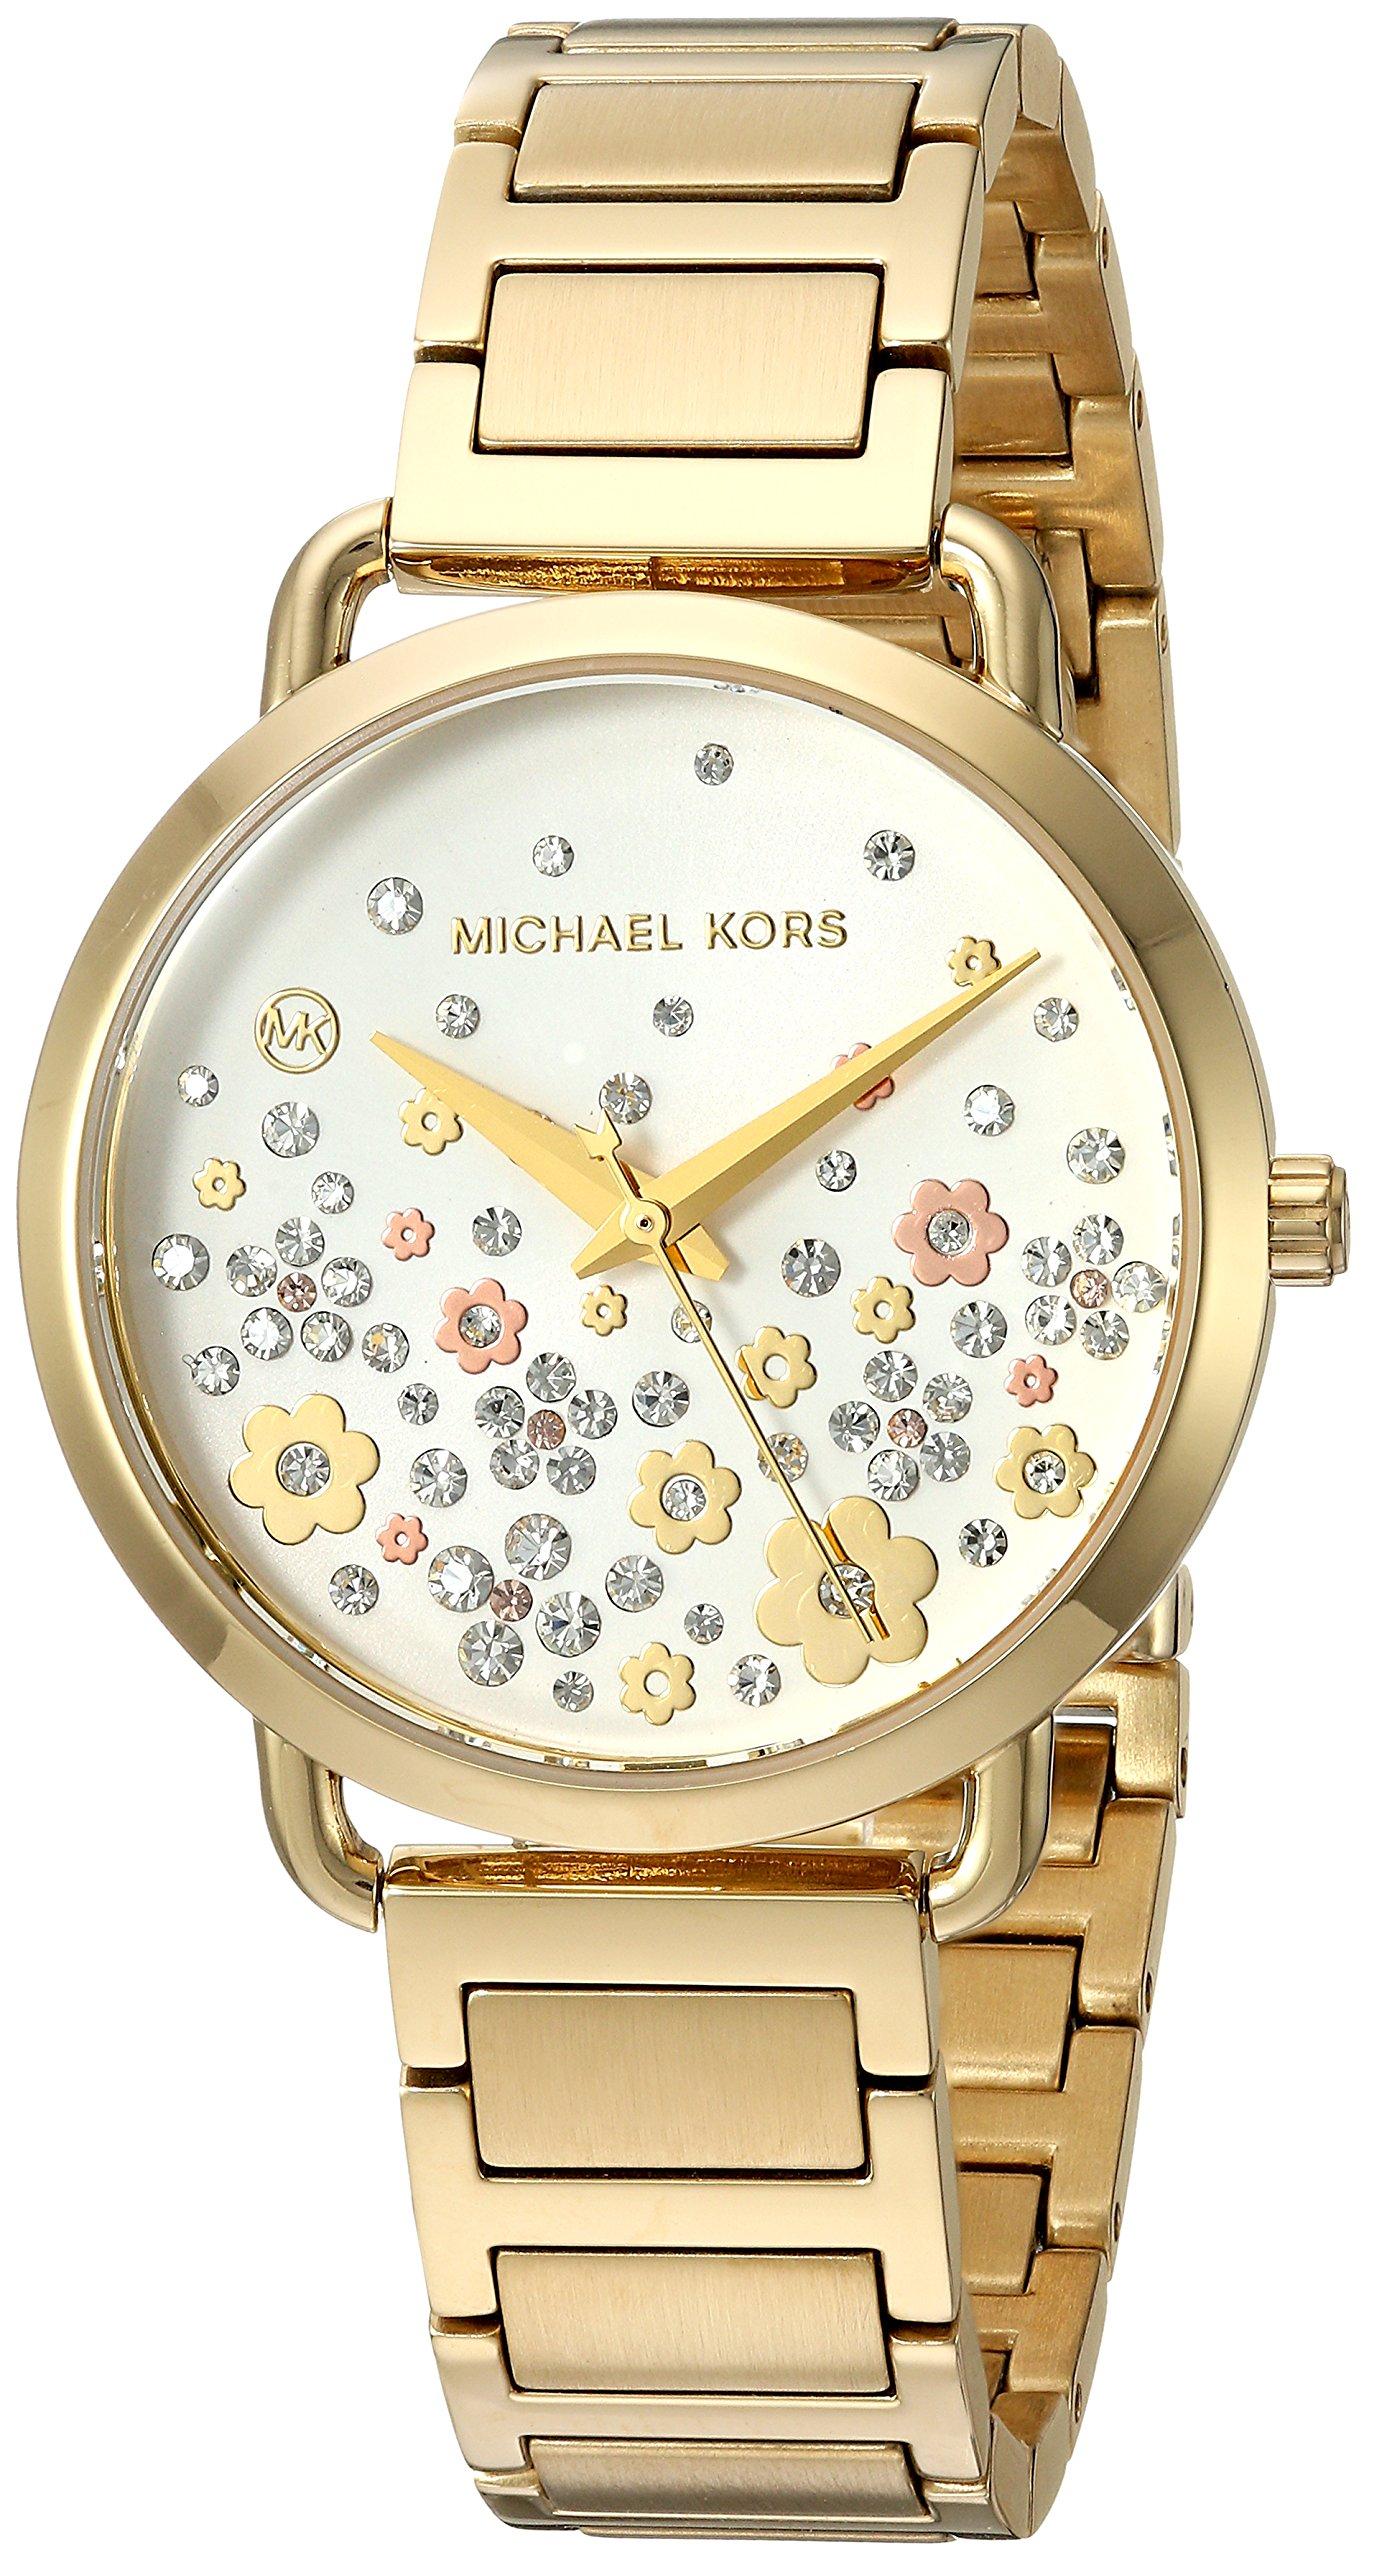 Michael Kors Women's 'Portia' Quartz Stainless Steel Casual Watch, Color:Gold-Toned (Model: MK3840)